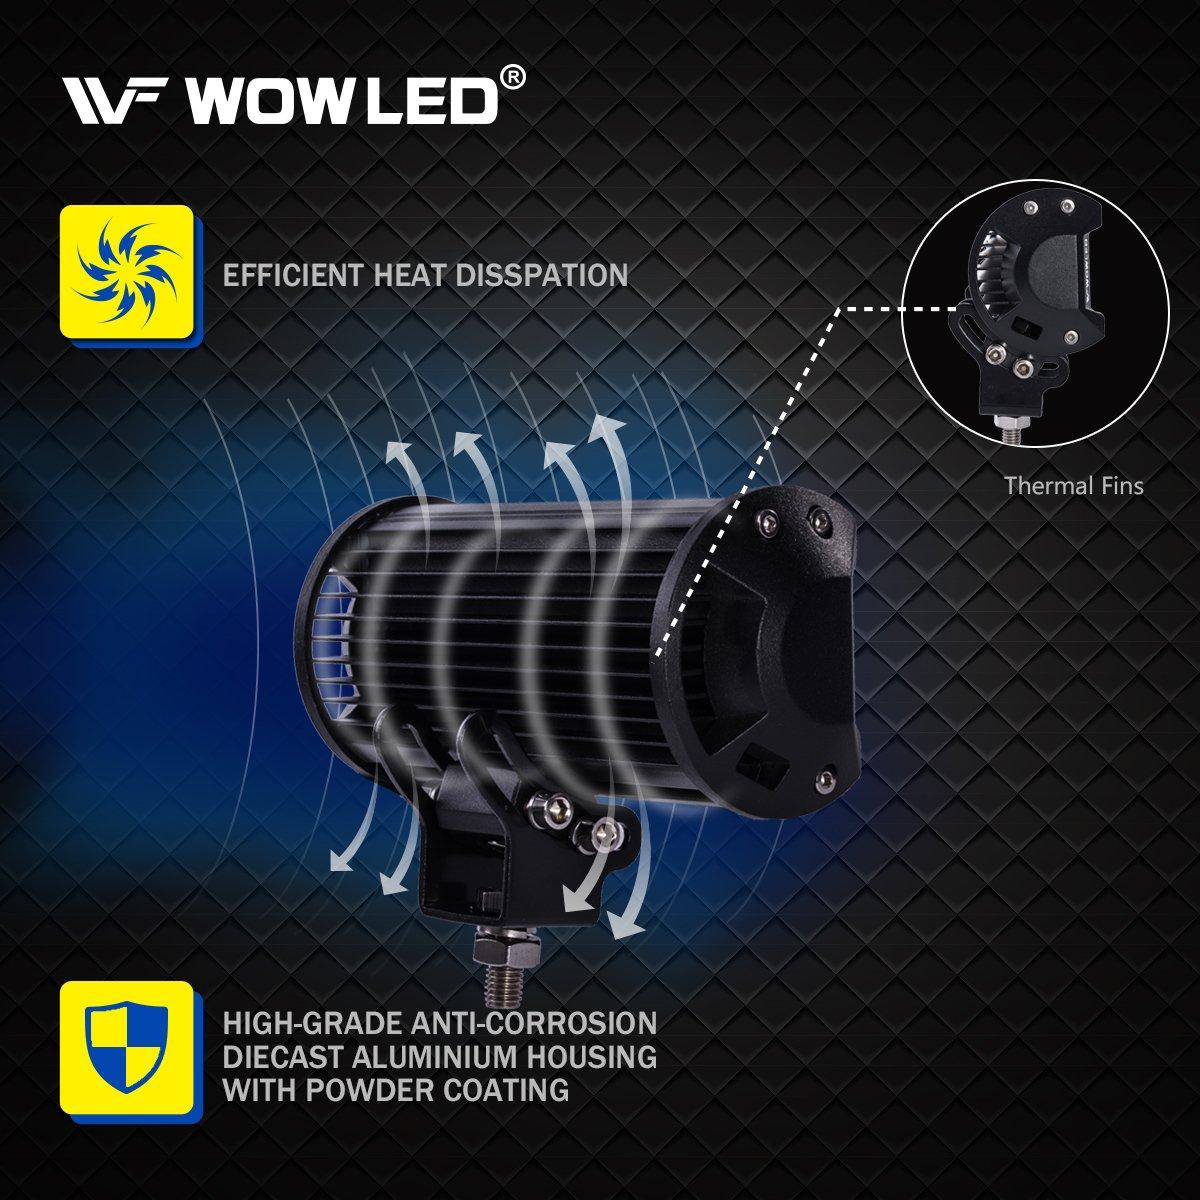 WOWLED 2 Pack 36W LED Light Bar 7 Inch CREE LED Lights Bar Lamp Light Floodlight Driving Work Light Offroad Fog Light Lamp Truck Car UTE 4WD